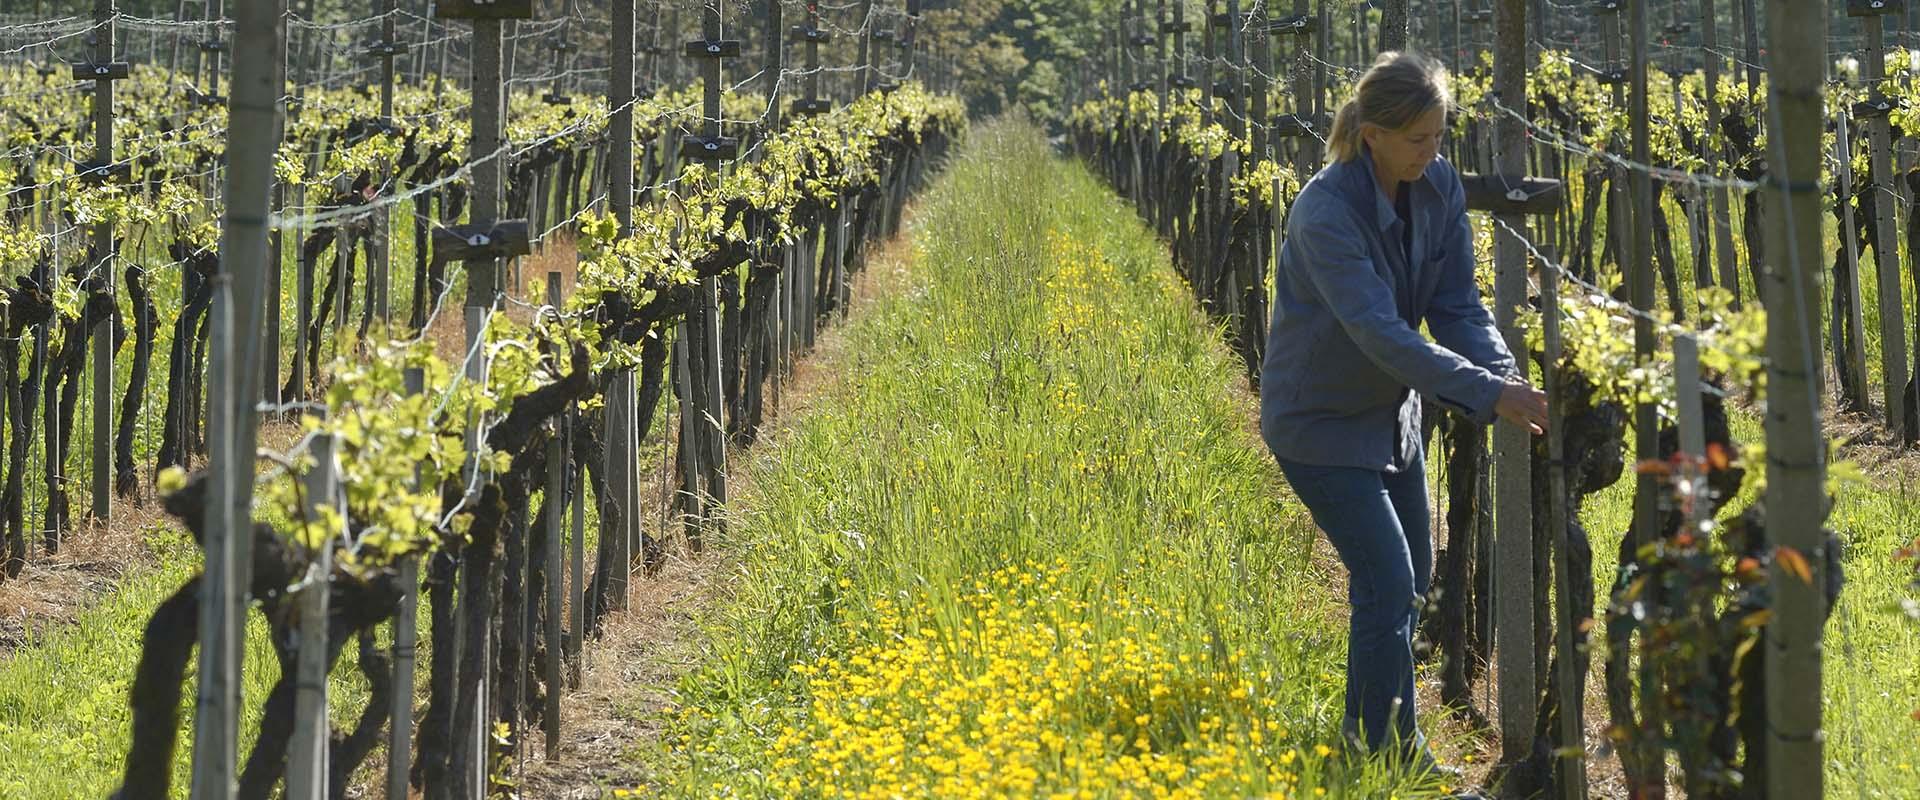 Weingut Rütihof - Monat Mai